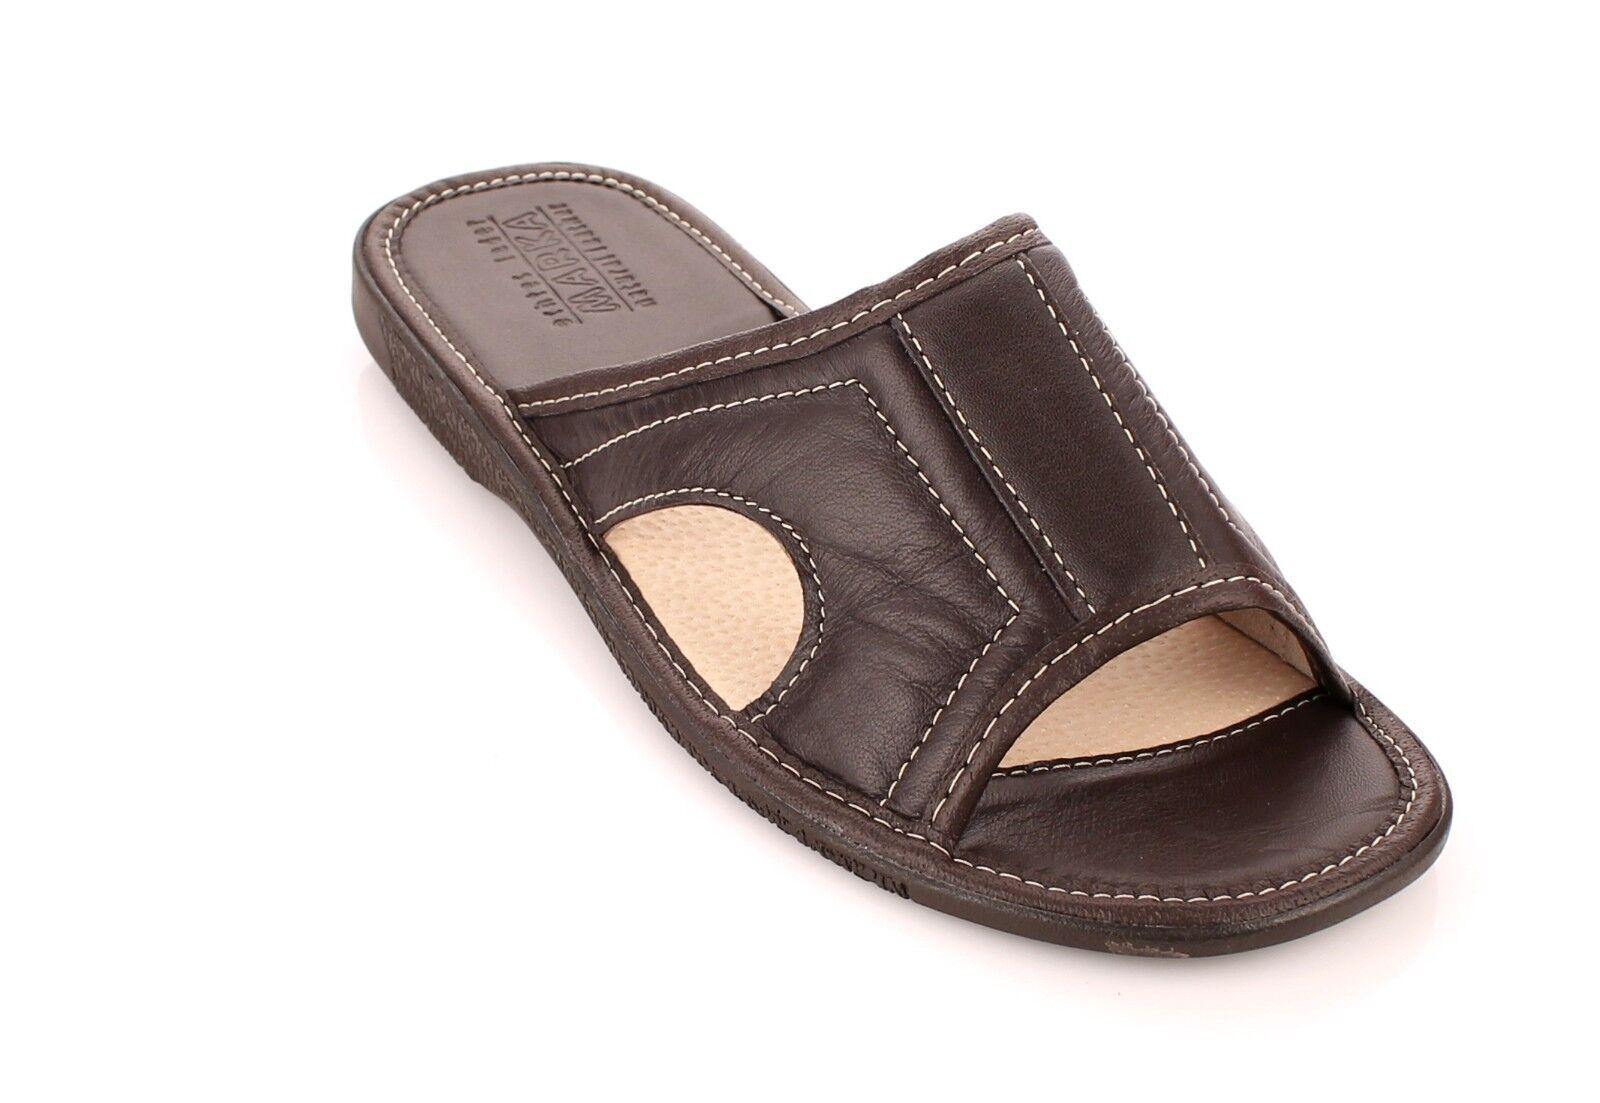 herren leder pantoletten braun pantoffeln hausschuhe. Black Bedroom Furniture Sets. Home Design Ideas